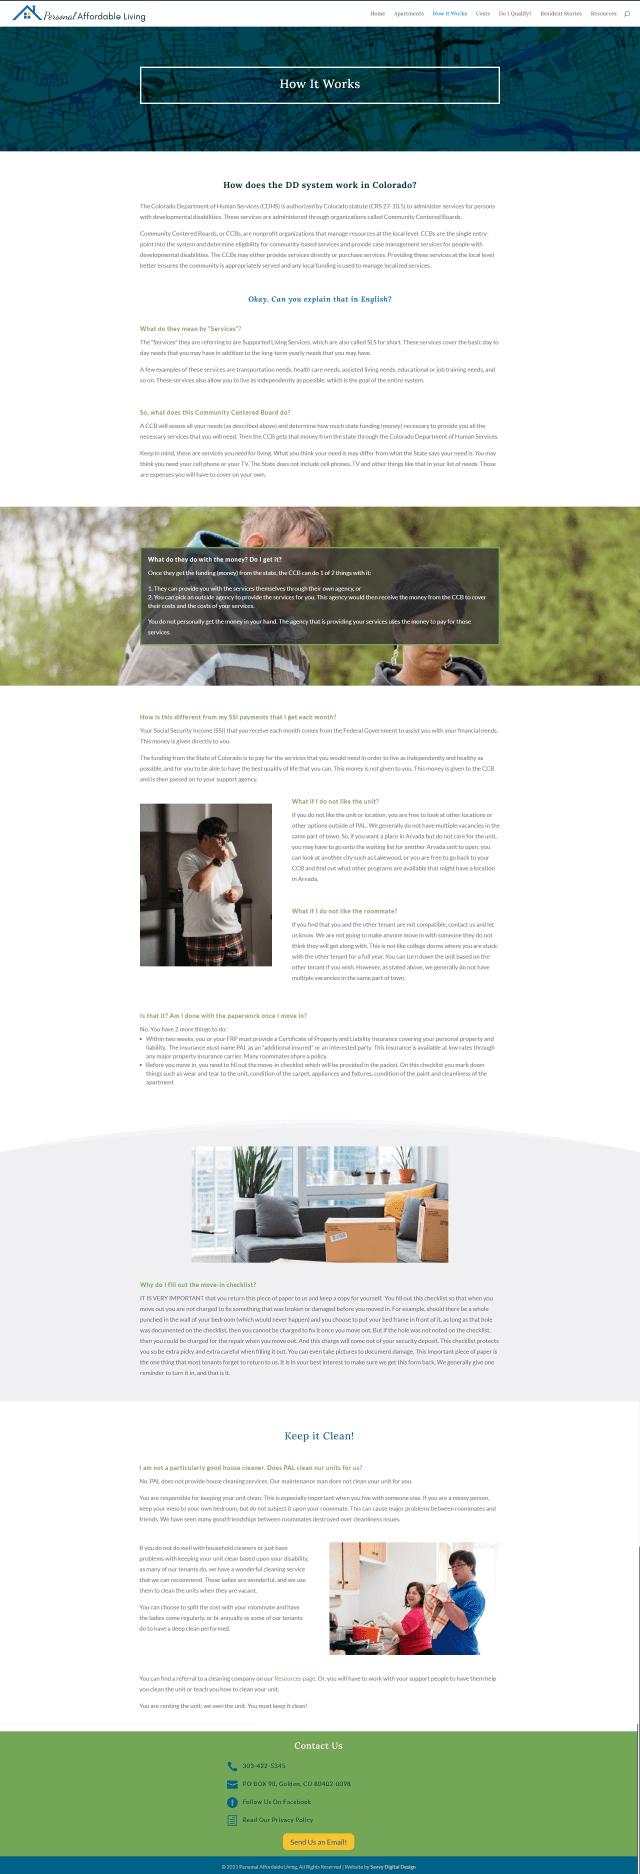 screenshot of PAL website page 2